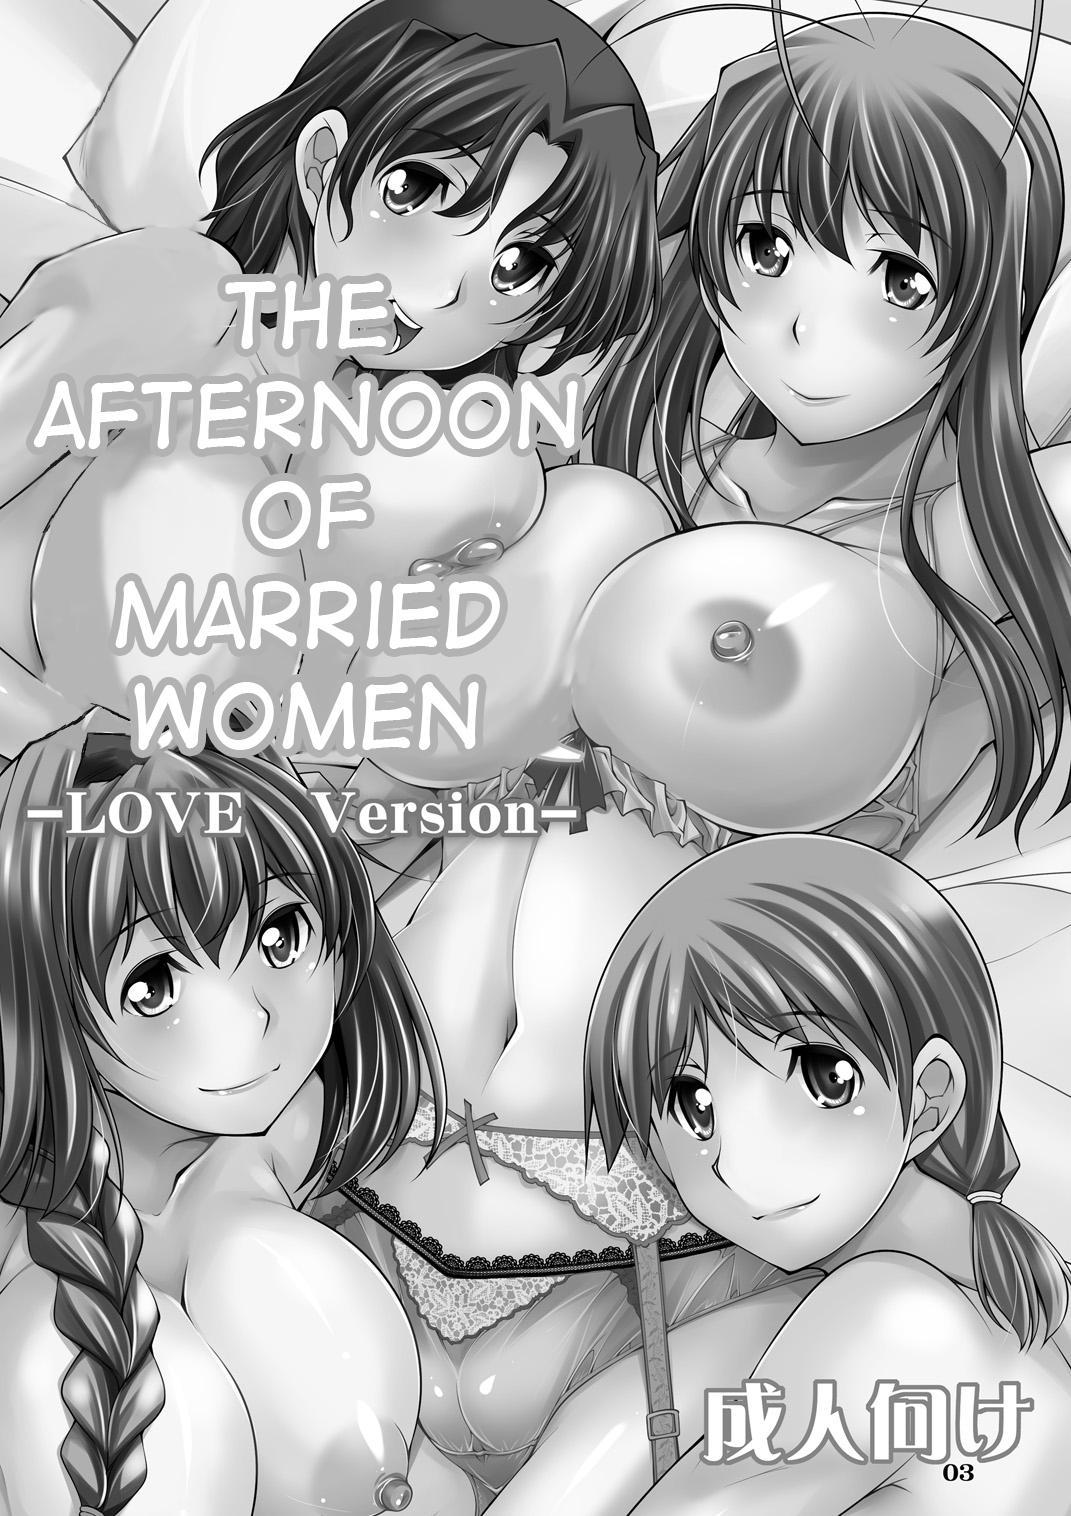 [Manamagu (zen9)] Hitozuma-tachi no Gogo - LOVE Version   Afternoon of Housewives - LOVE Version (Various) [English] {doujin-moe.us} [Digital] 1